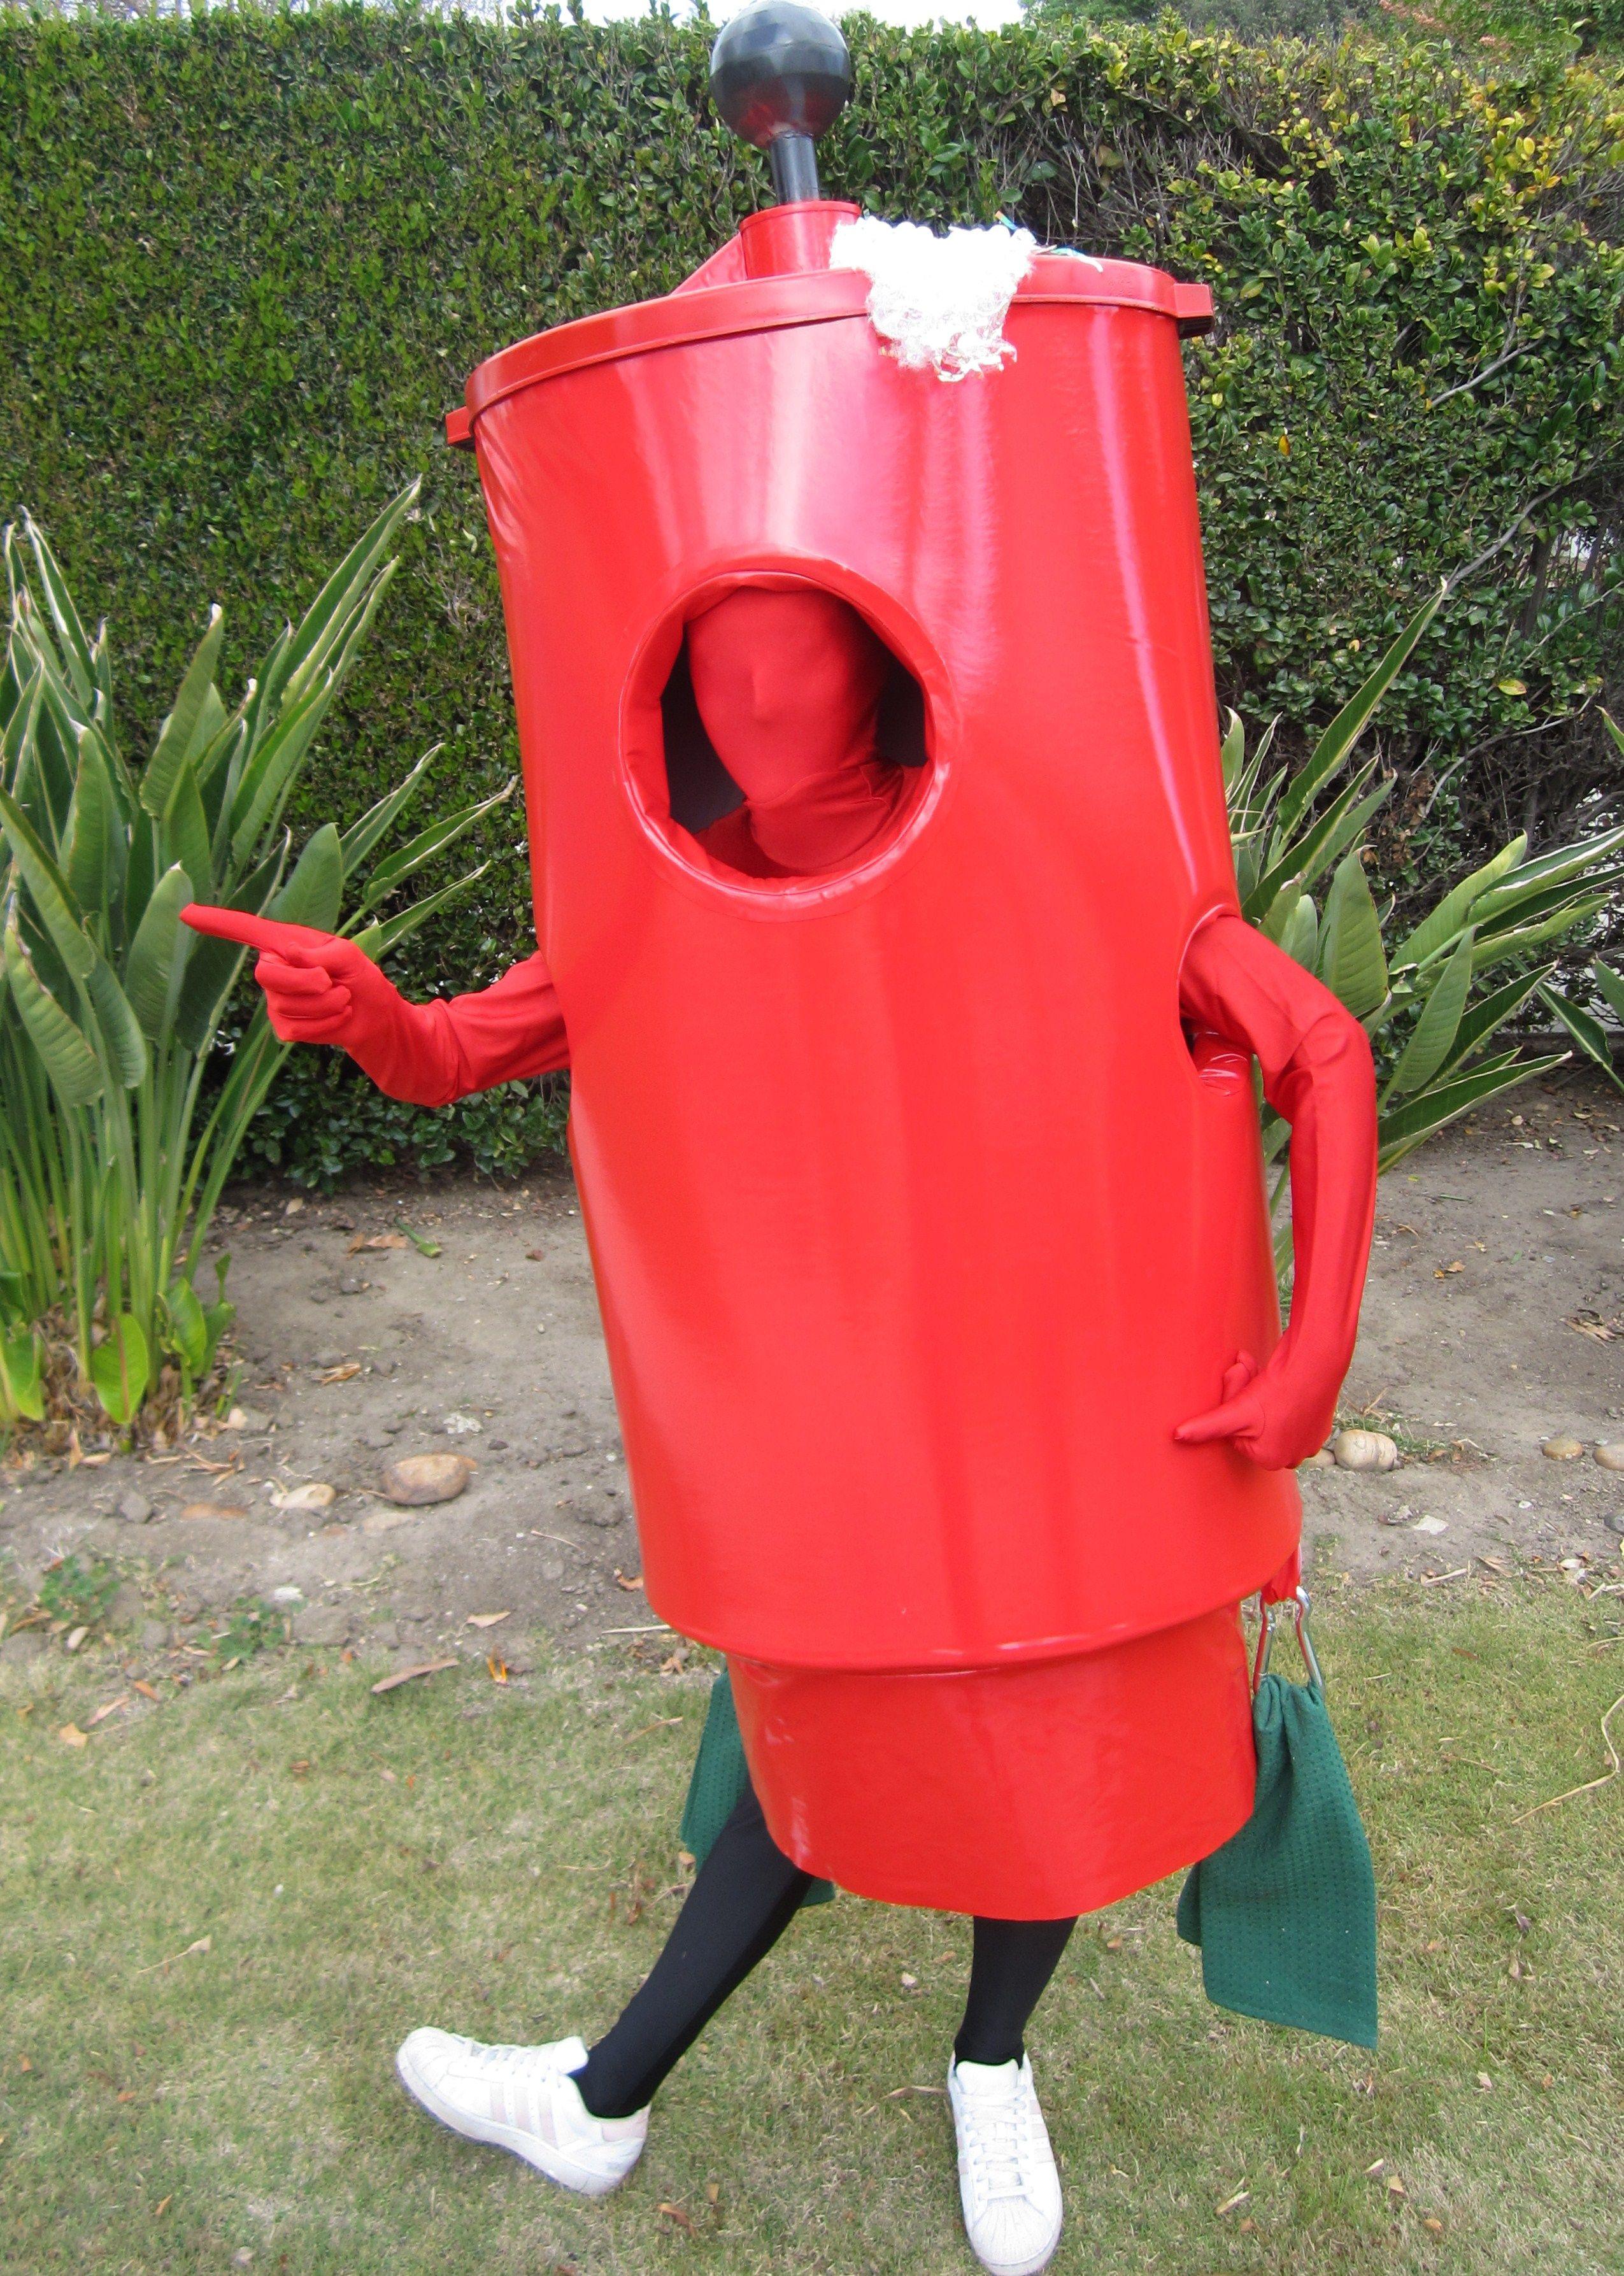 Giant golfball washer mascot costume custom designed for cbs sports by nicole beckett se